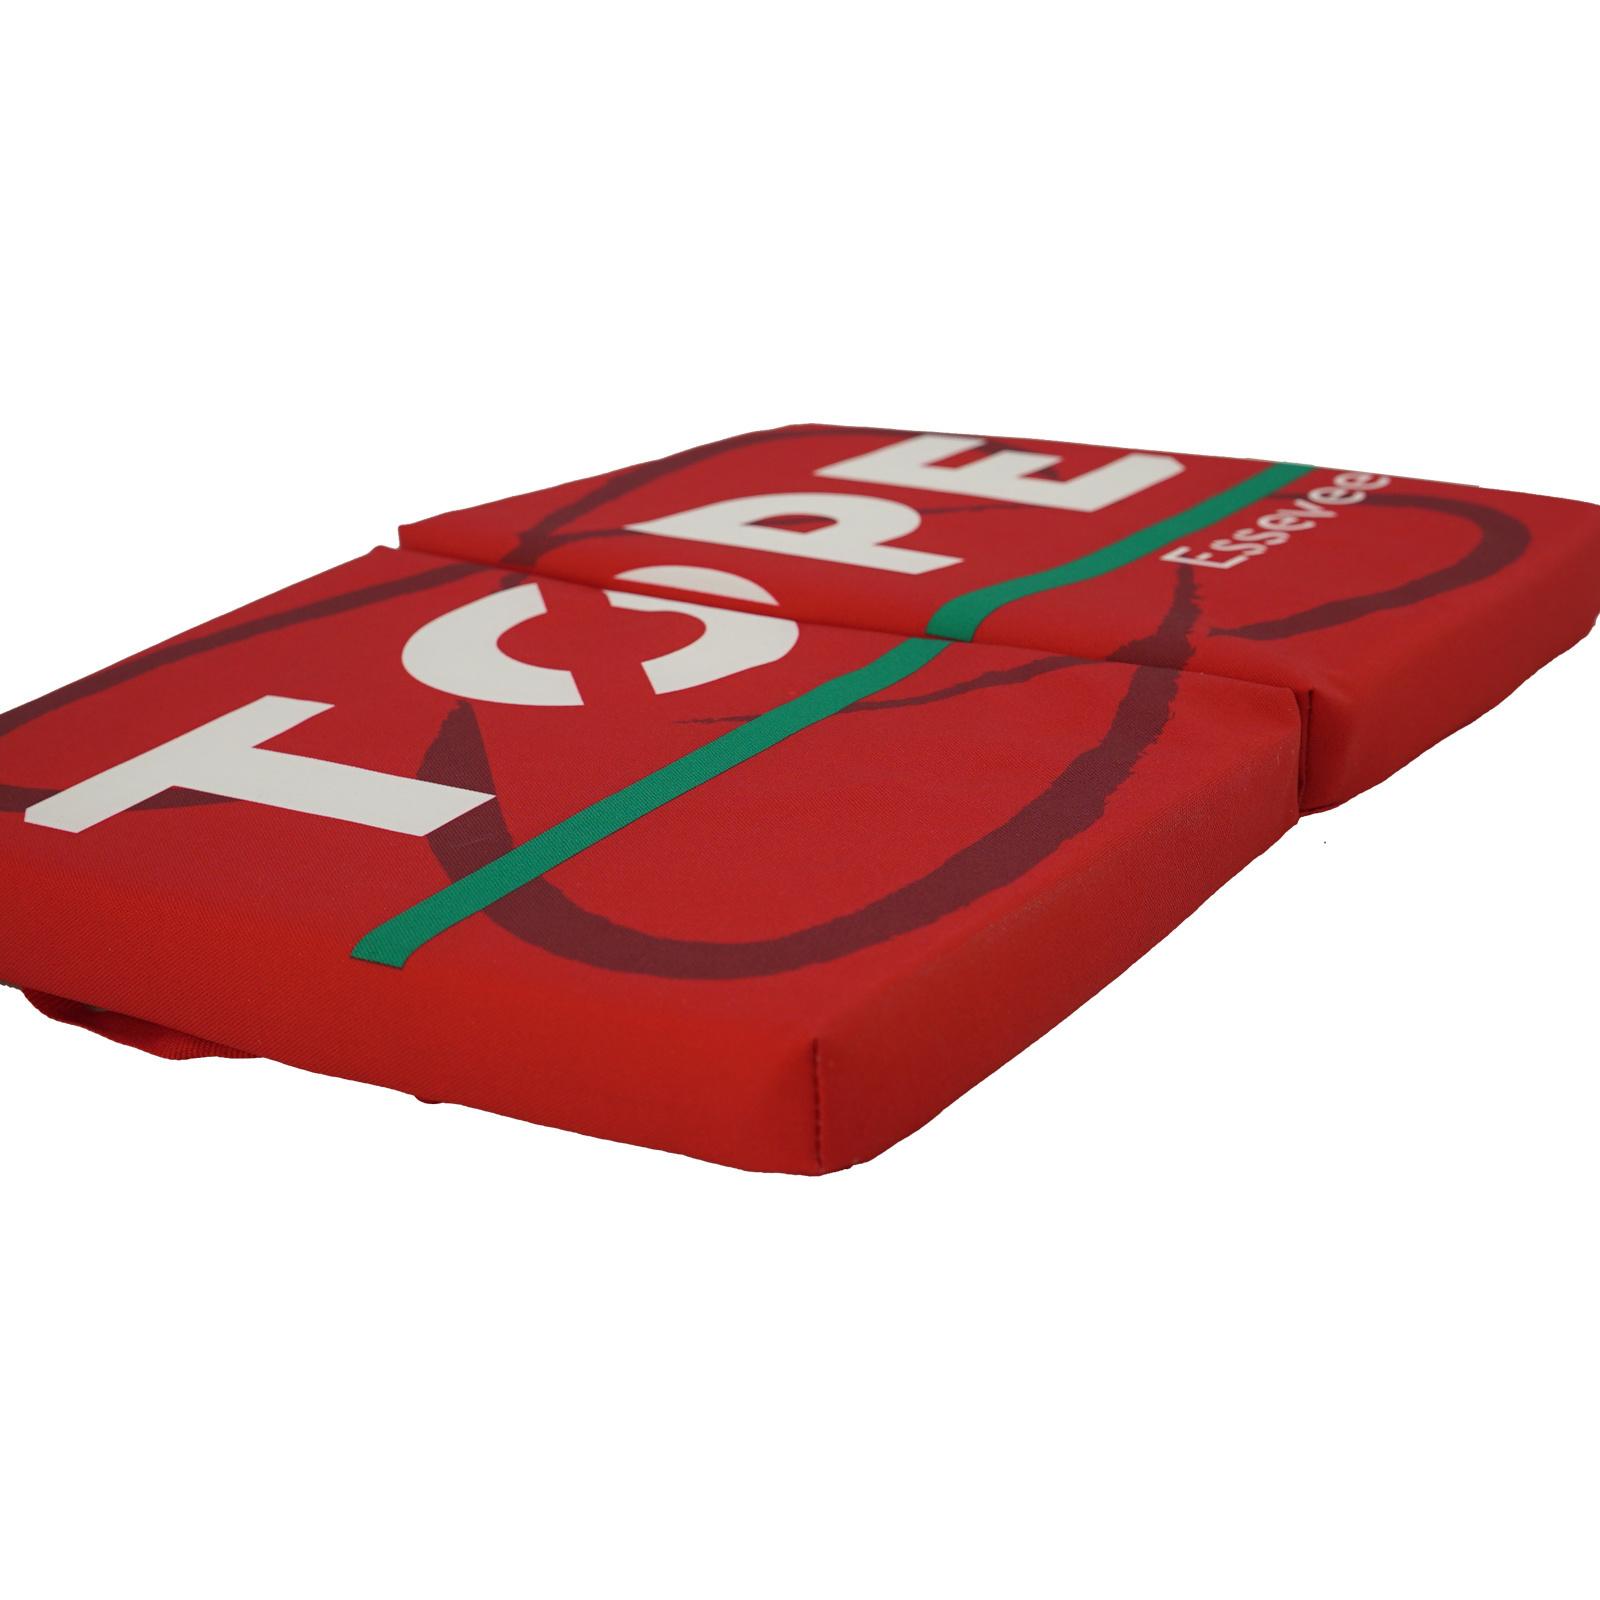 Topfanz Stadion pillow